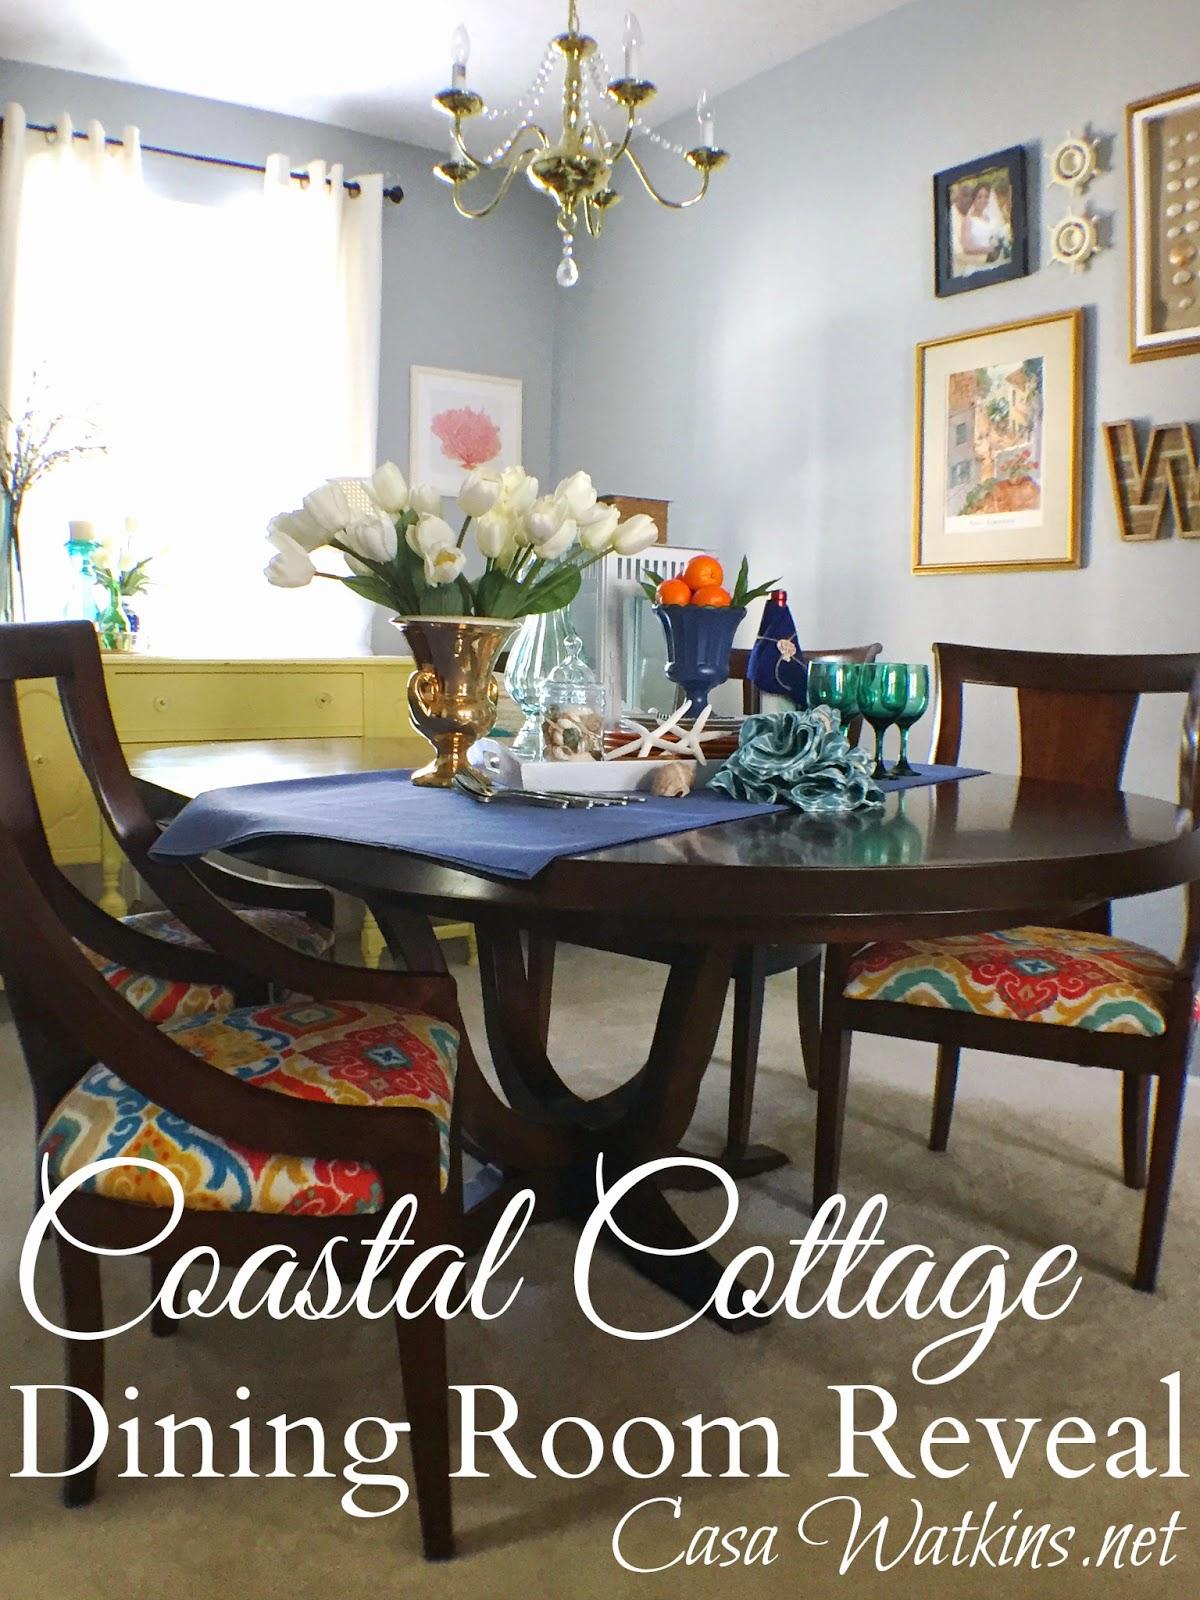 colorful coastal cottage dining room makeover reveal casa colorful coastal cottage dining room reveal at www casawatkins net